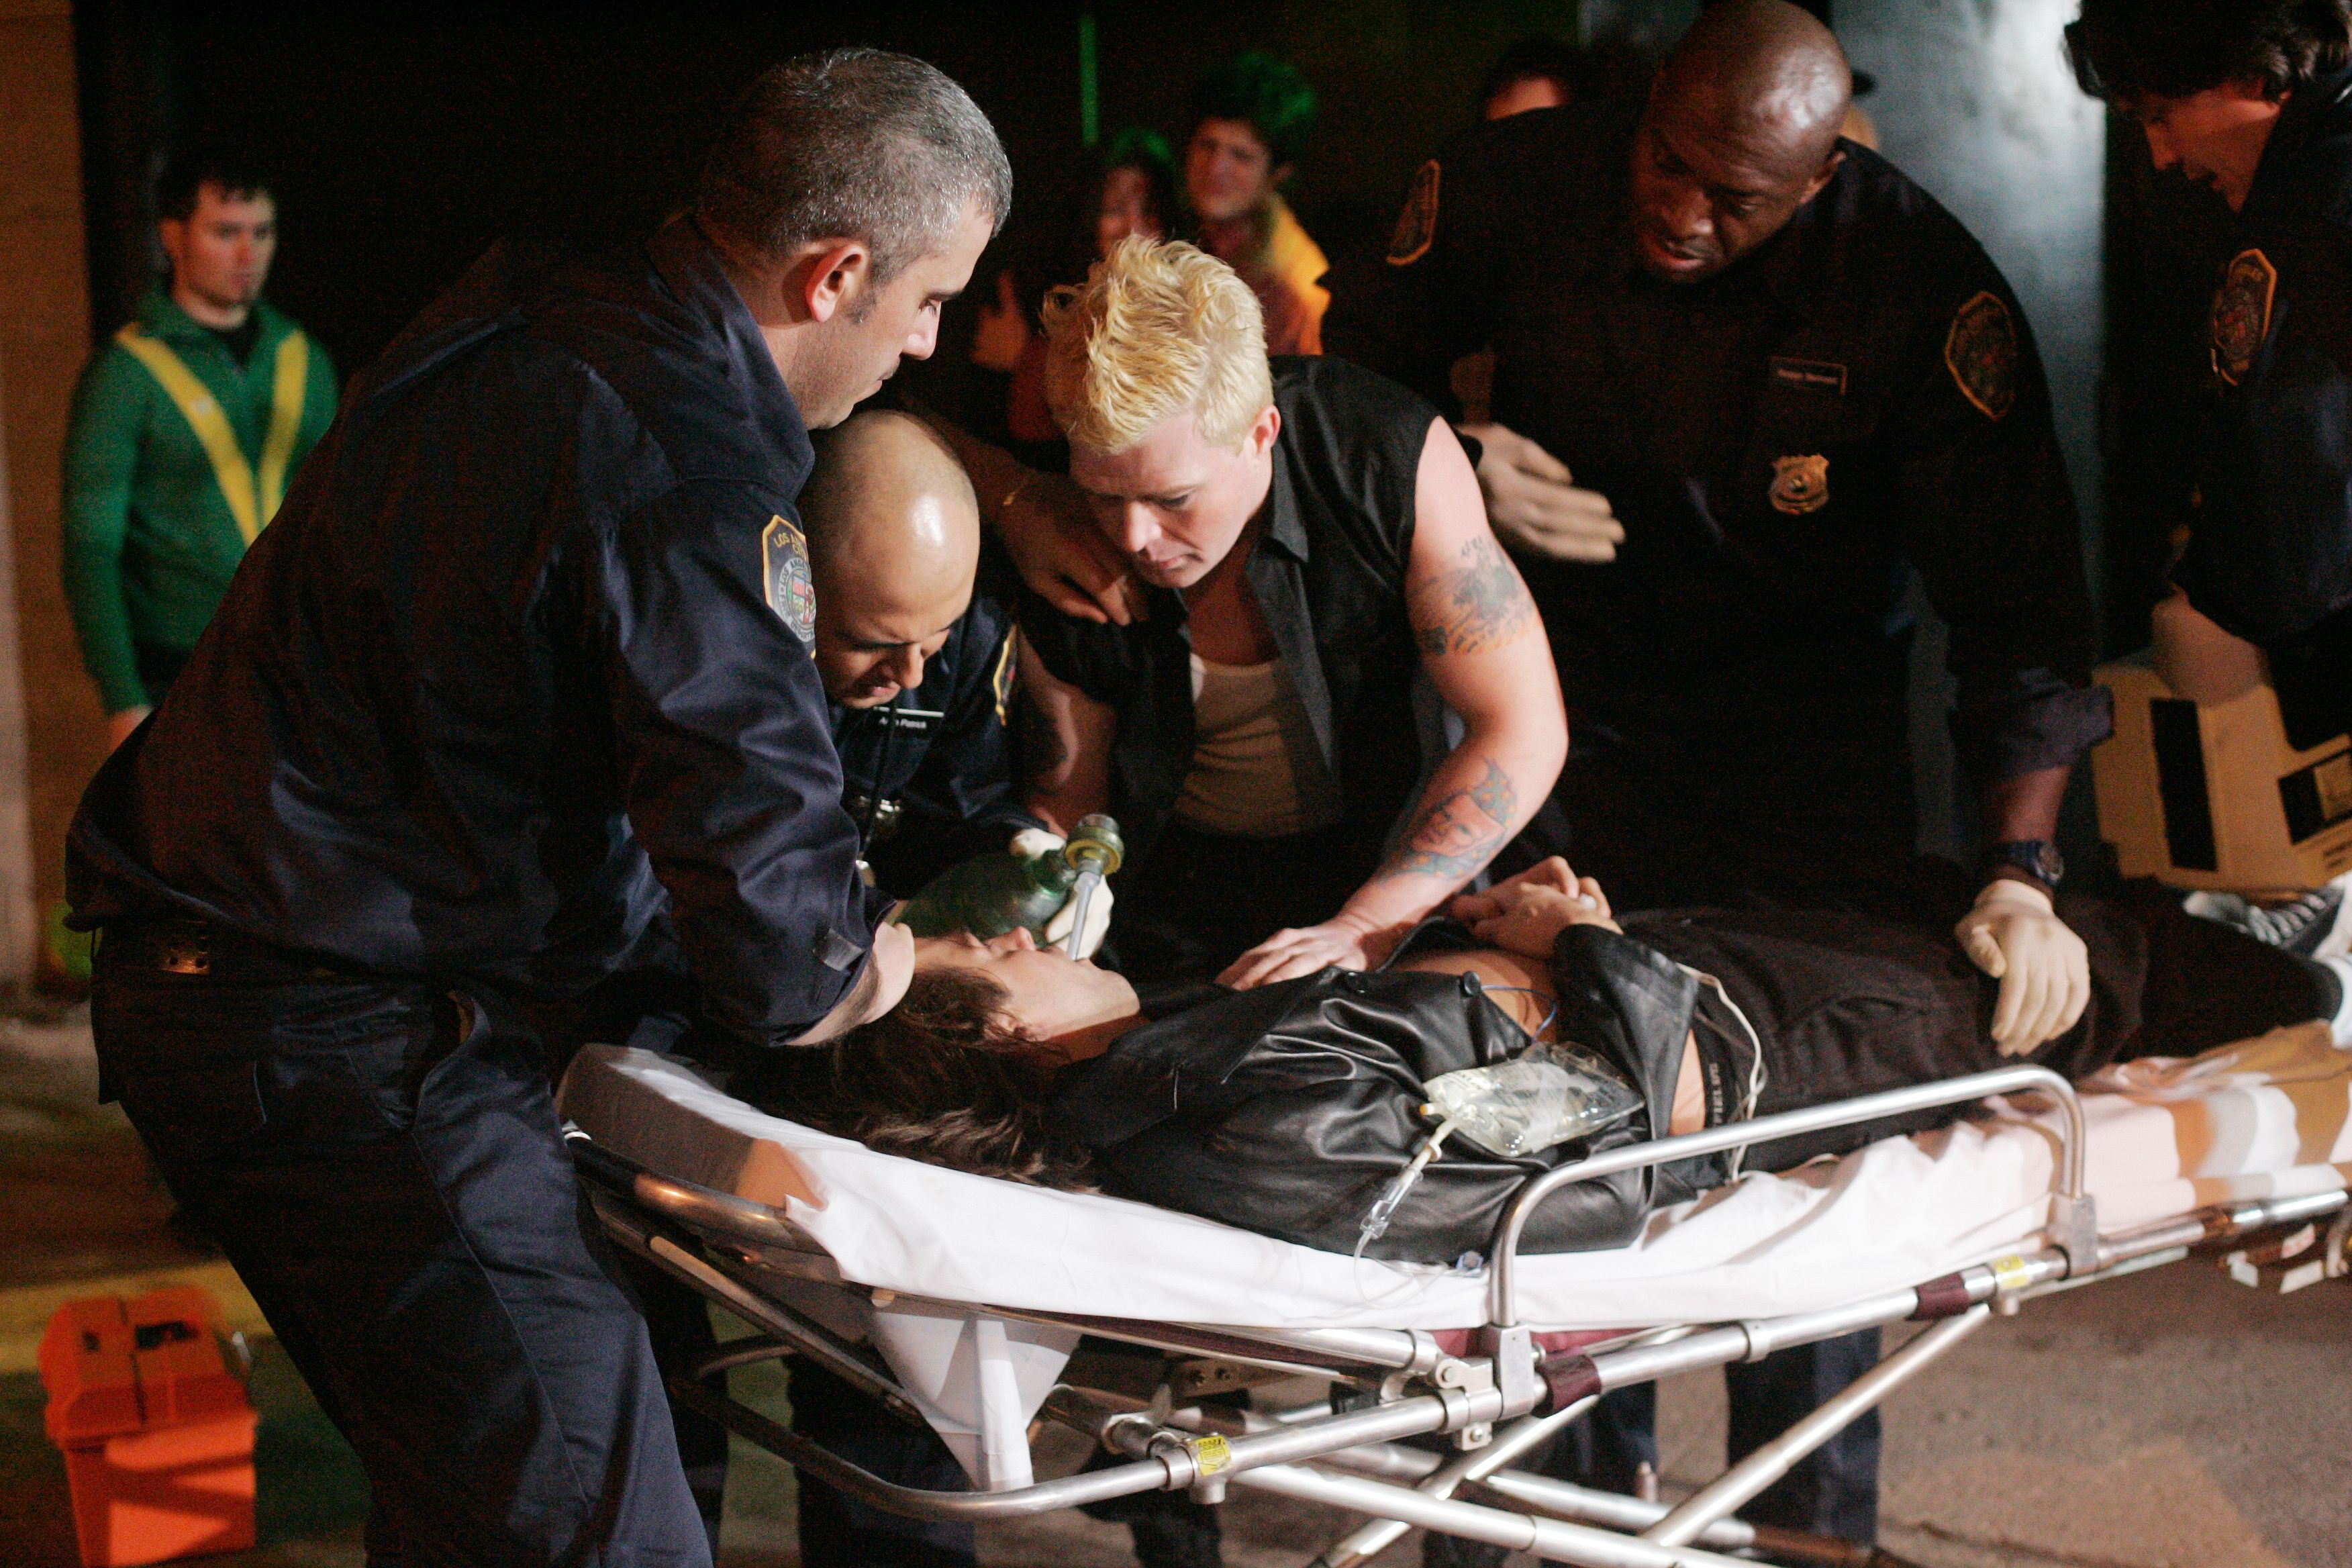 Car Crash In Phoenix Last Night